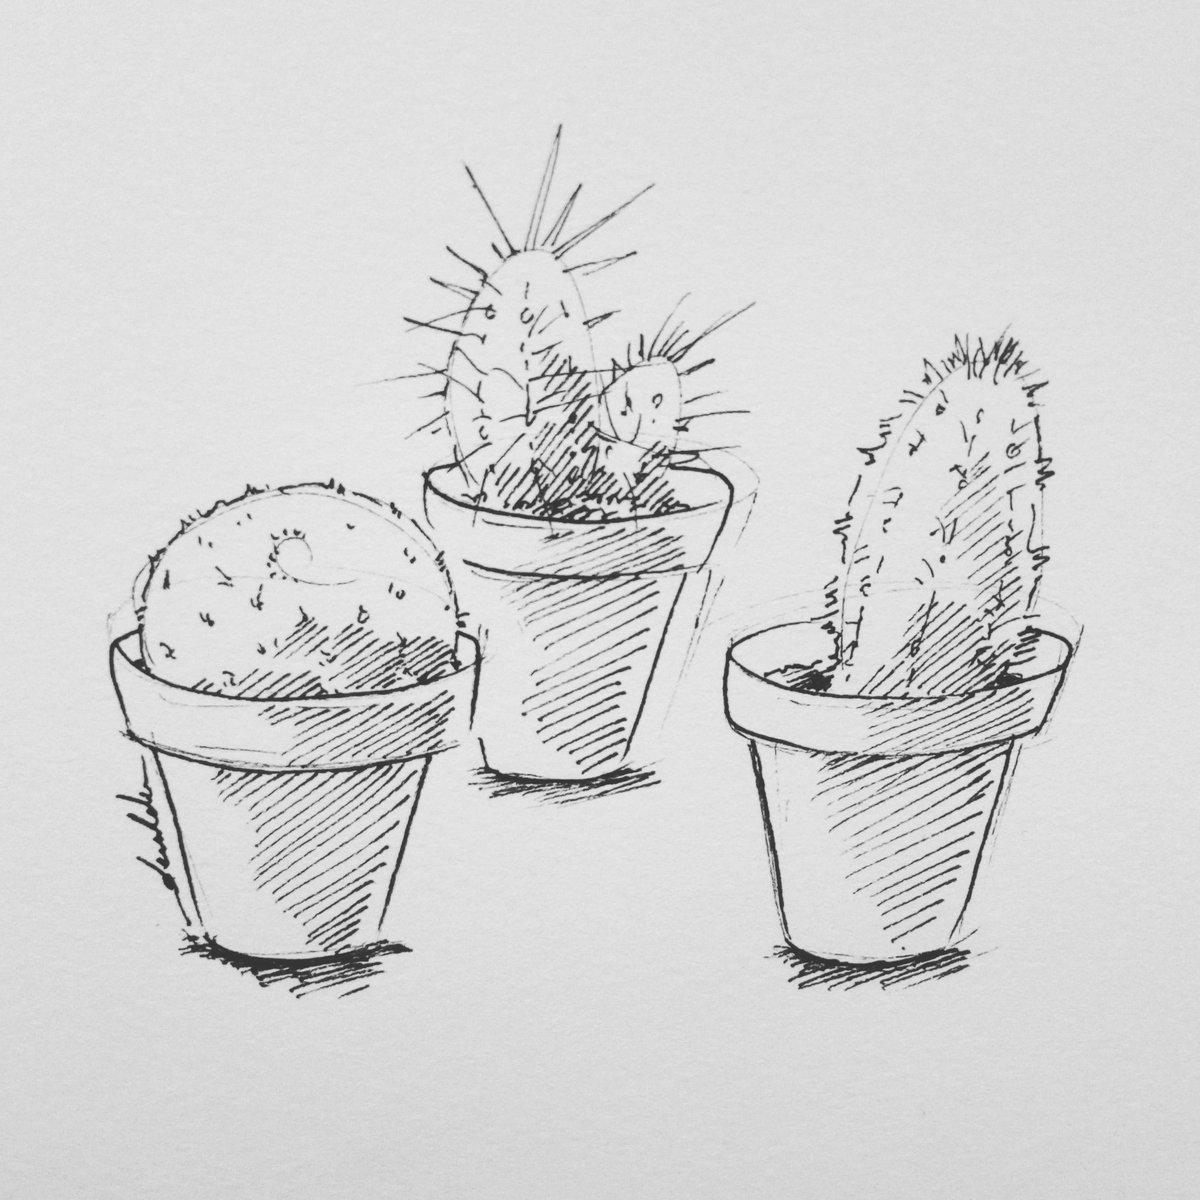 Cacti #dailyart #dailyillustration #cacti #cactus #plants #blackandwhitedrawing https://t.co/TbsNkRpZUG